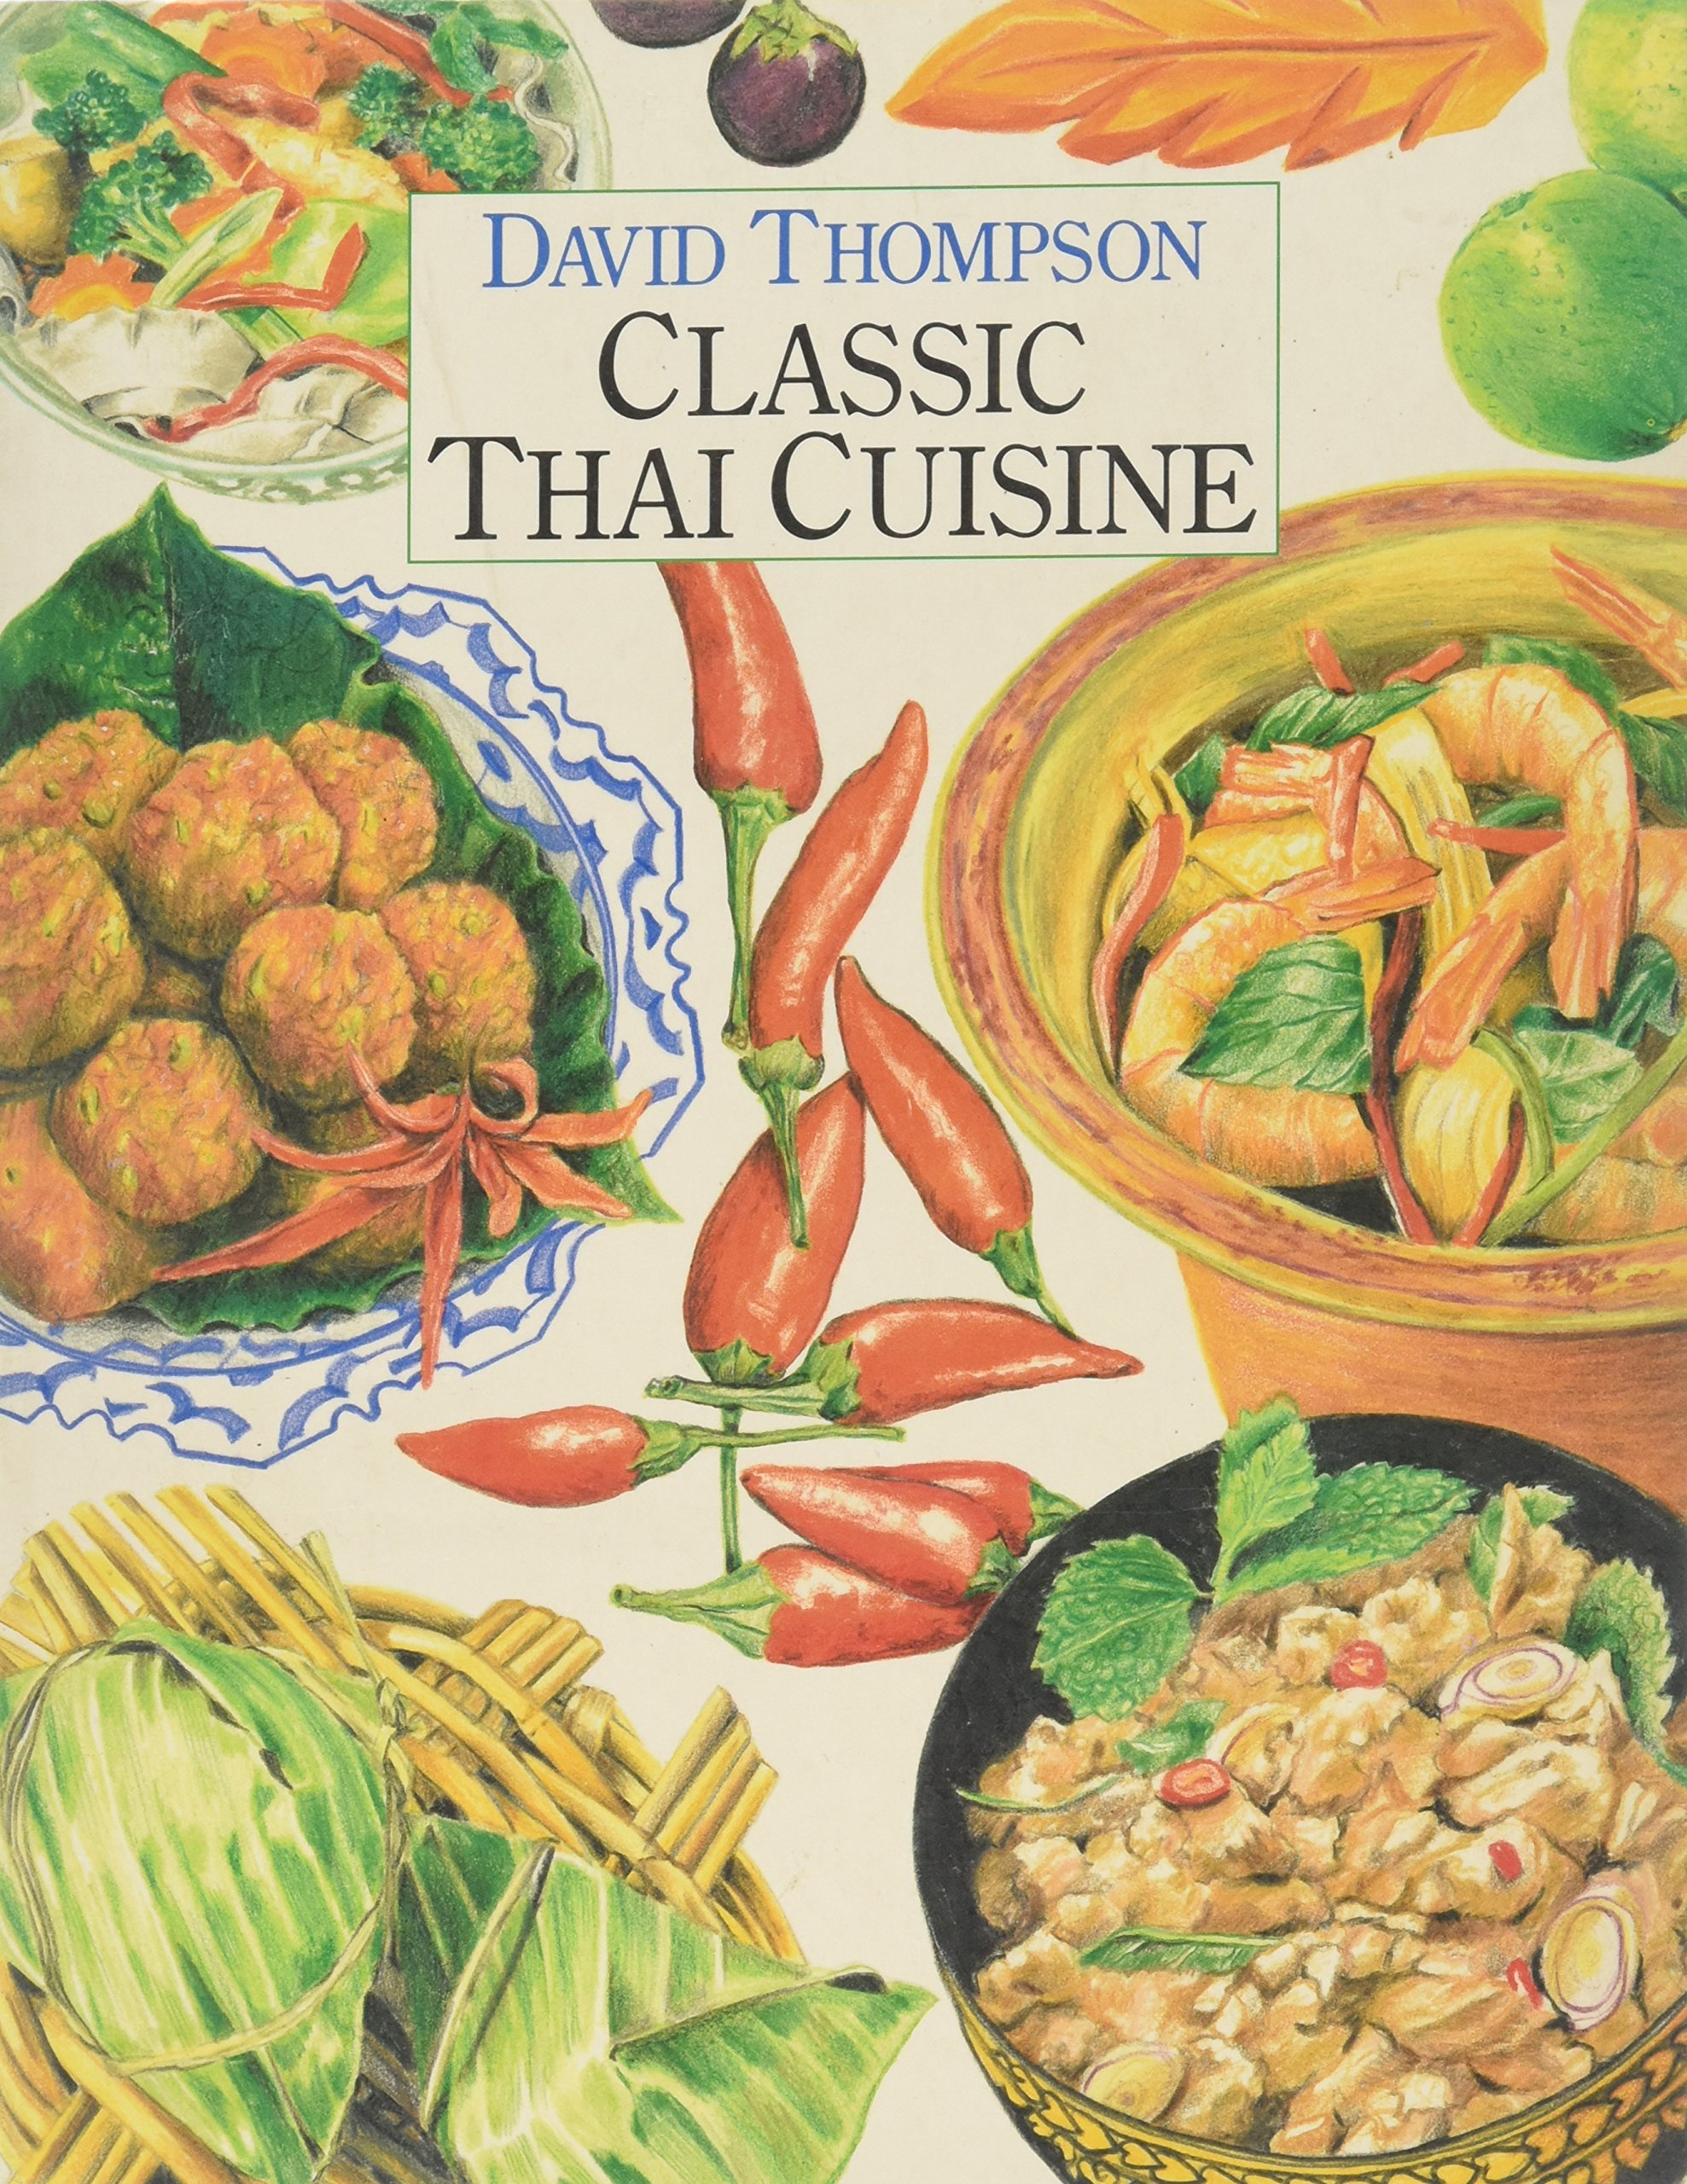 Classic thai cuisine amazon david thompson helen semmler classic thai cuisine amazon david thompson helen semmler fremdsprachige bcher forumfinder Choice Image